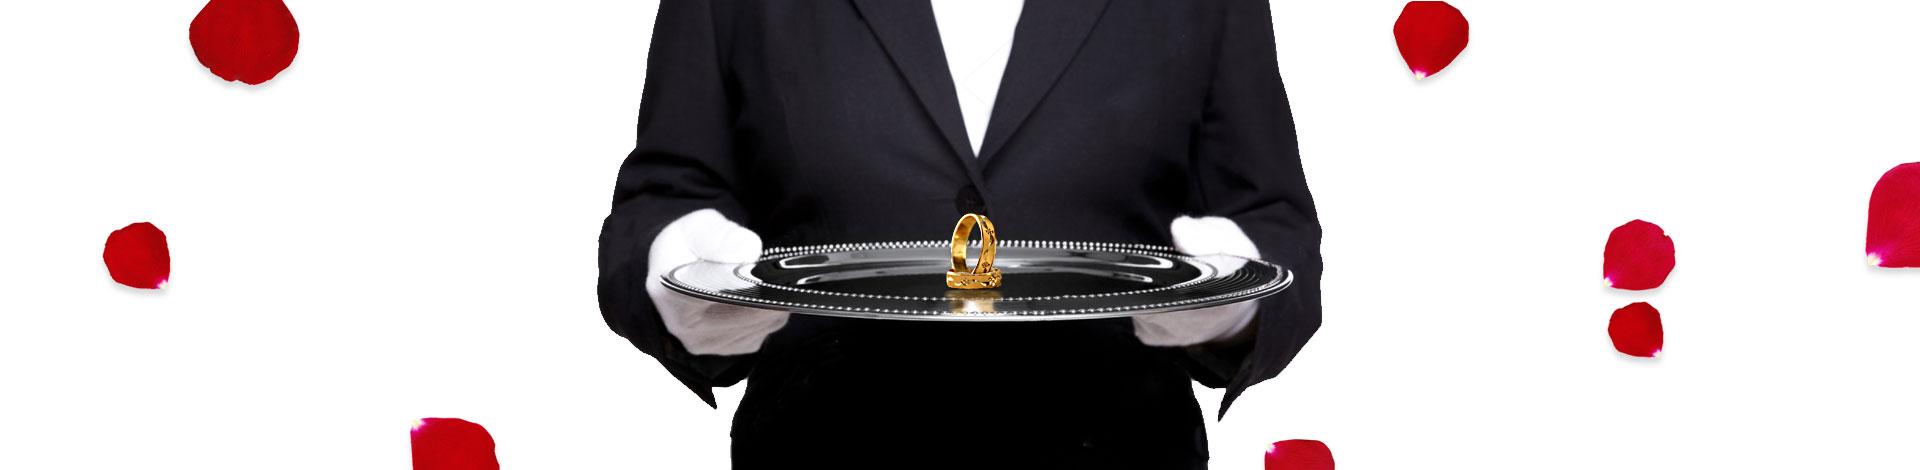 Luxury jewelry & diamonds | Free tailor made advise ✔ Zazare Diamonds